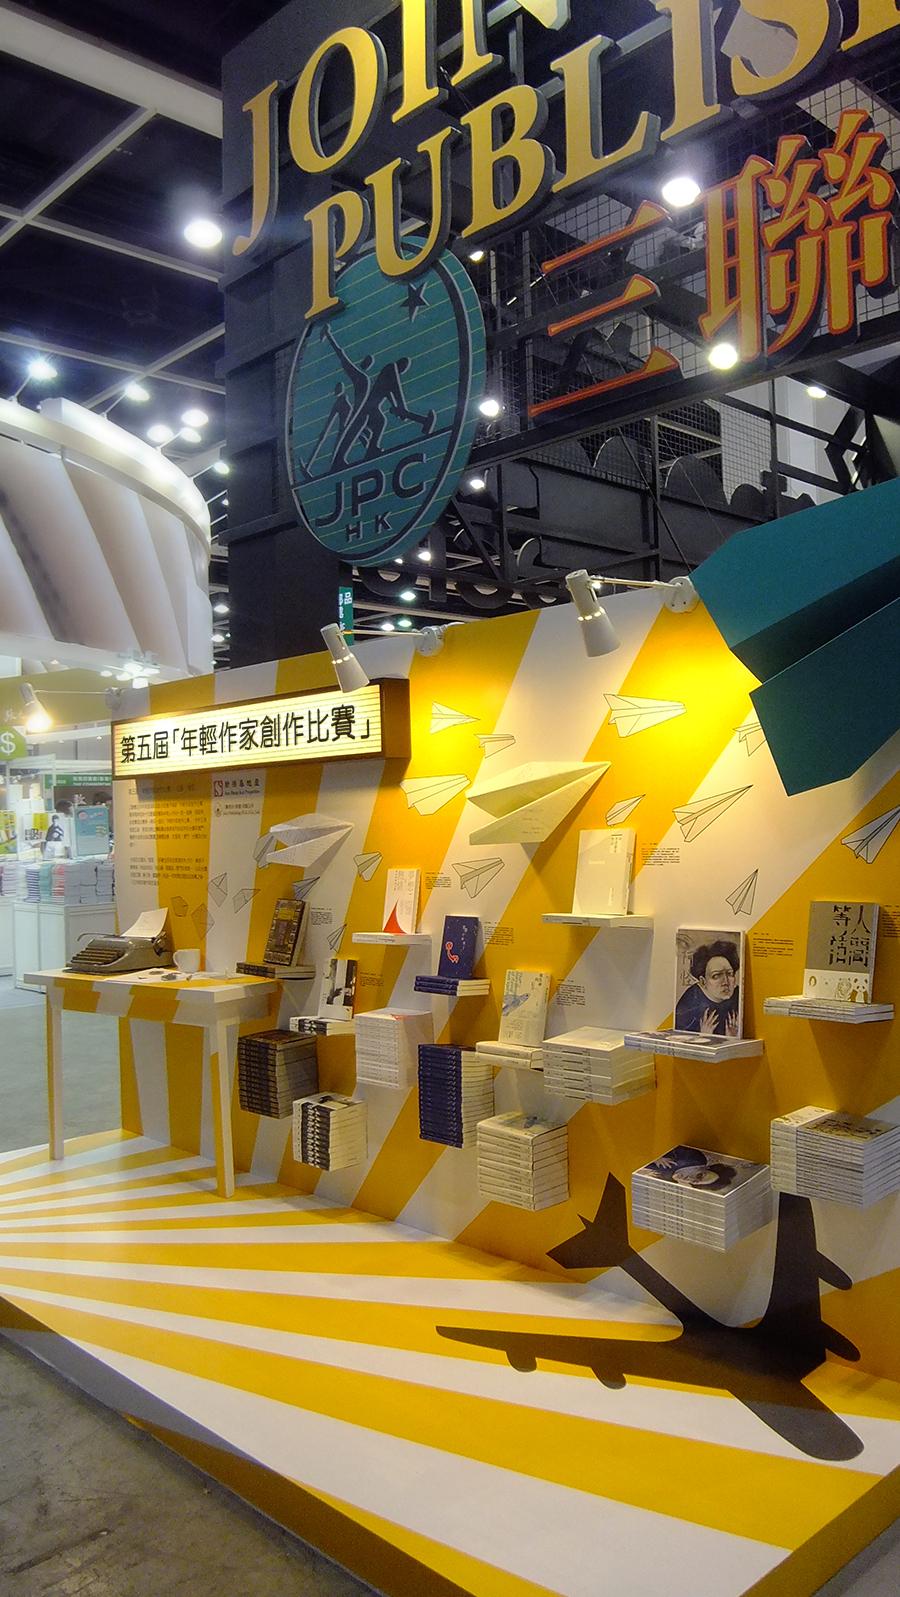 2015-JP Bookfair-14.jpg